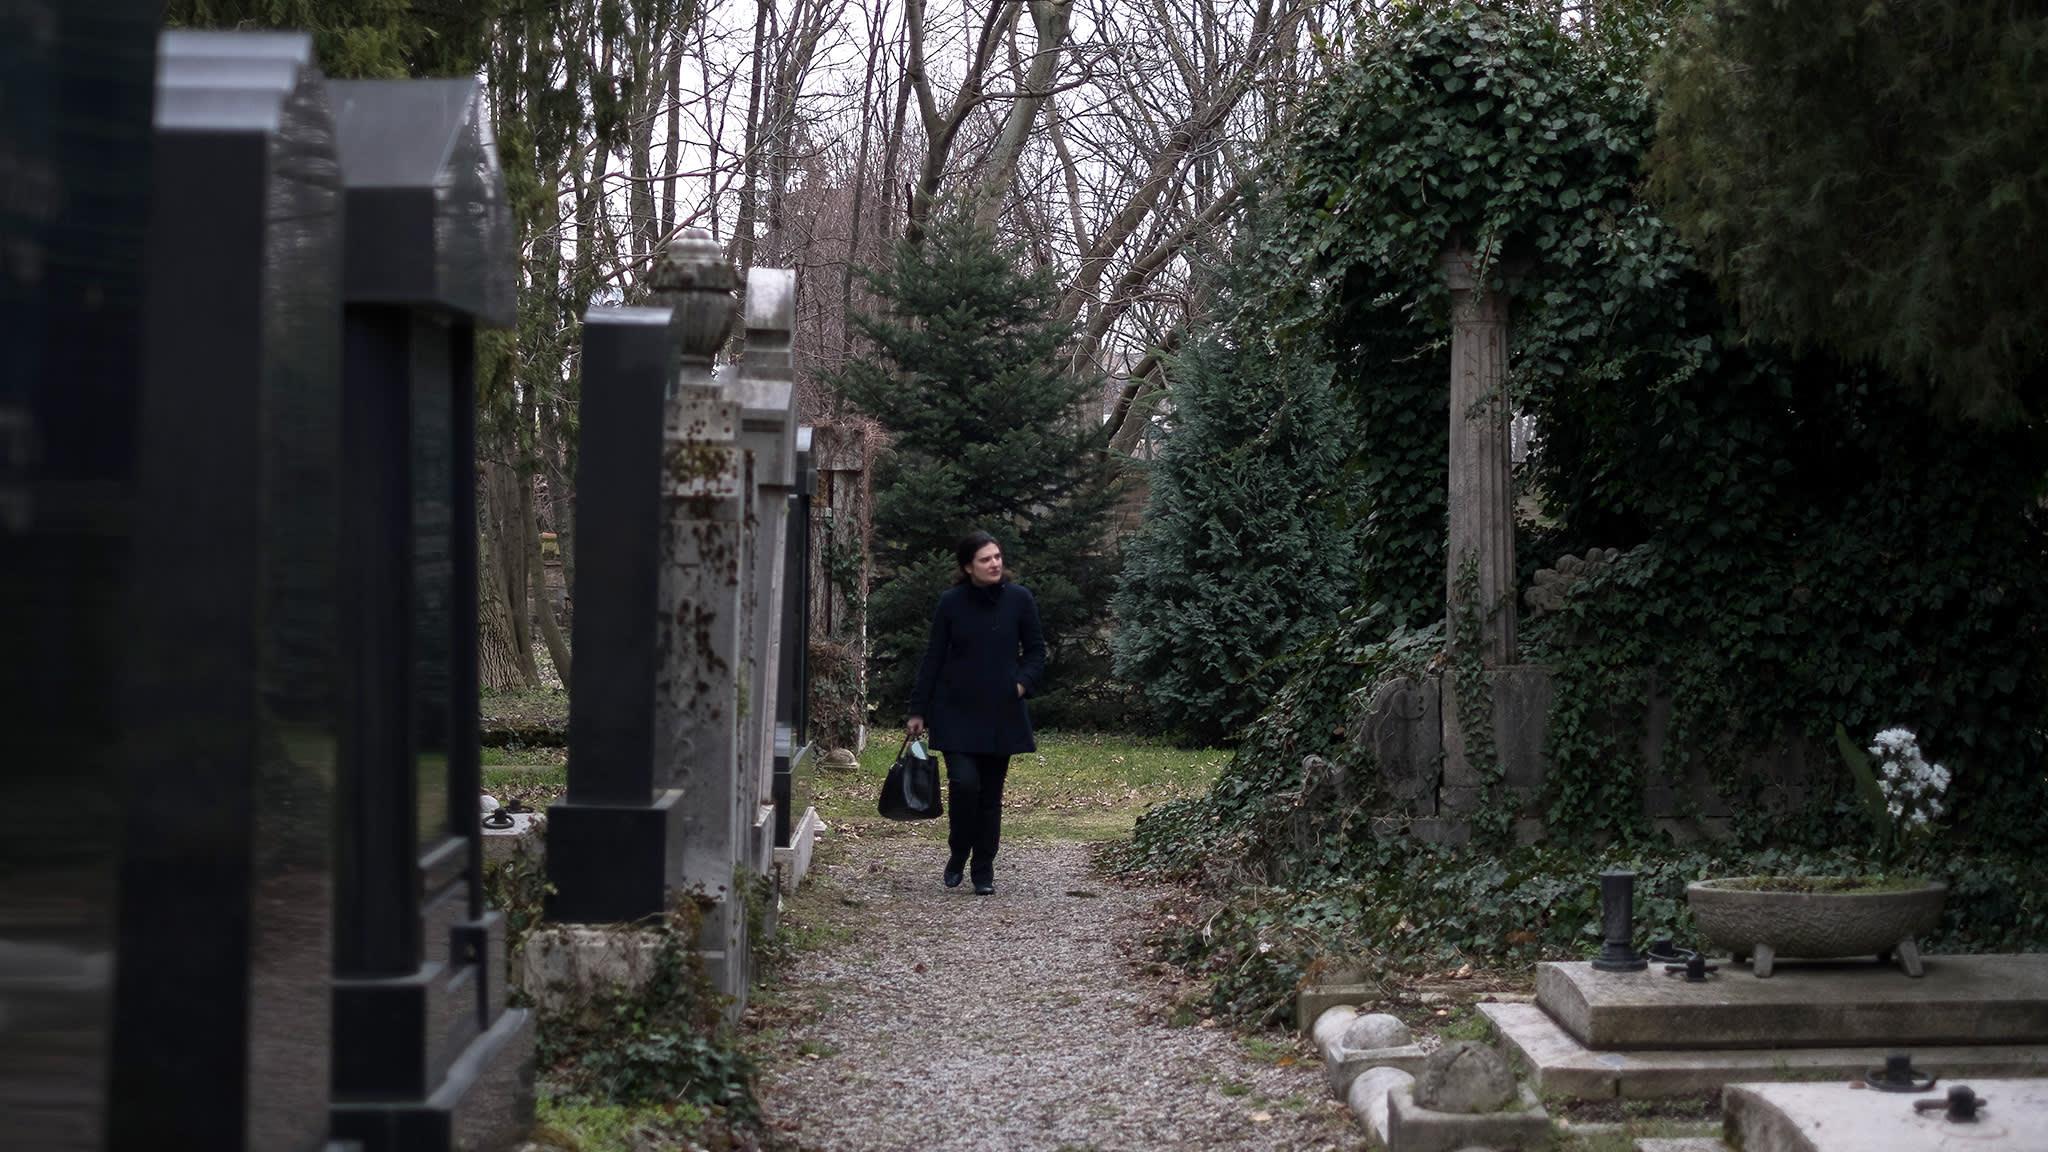 Hungary, anti-Semitism and my lost Jewish ancestors